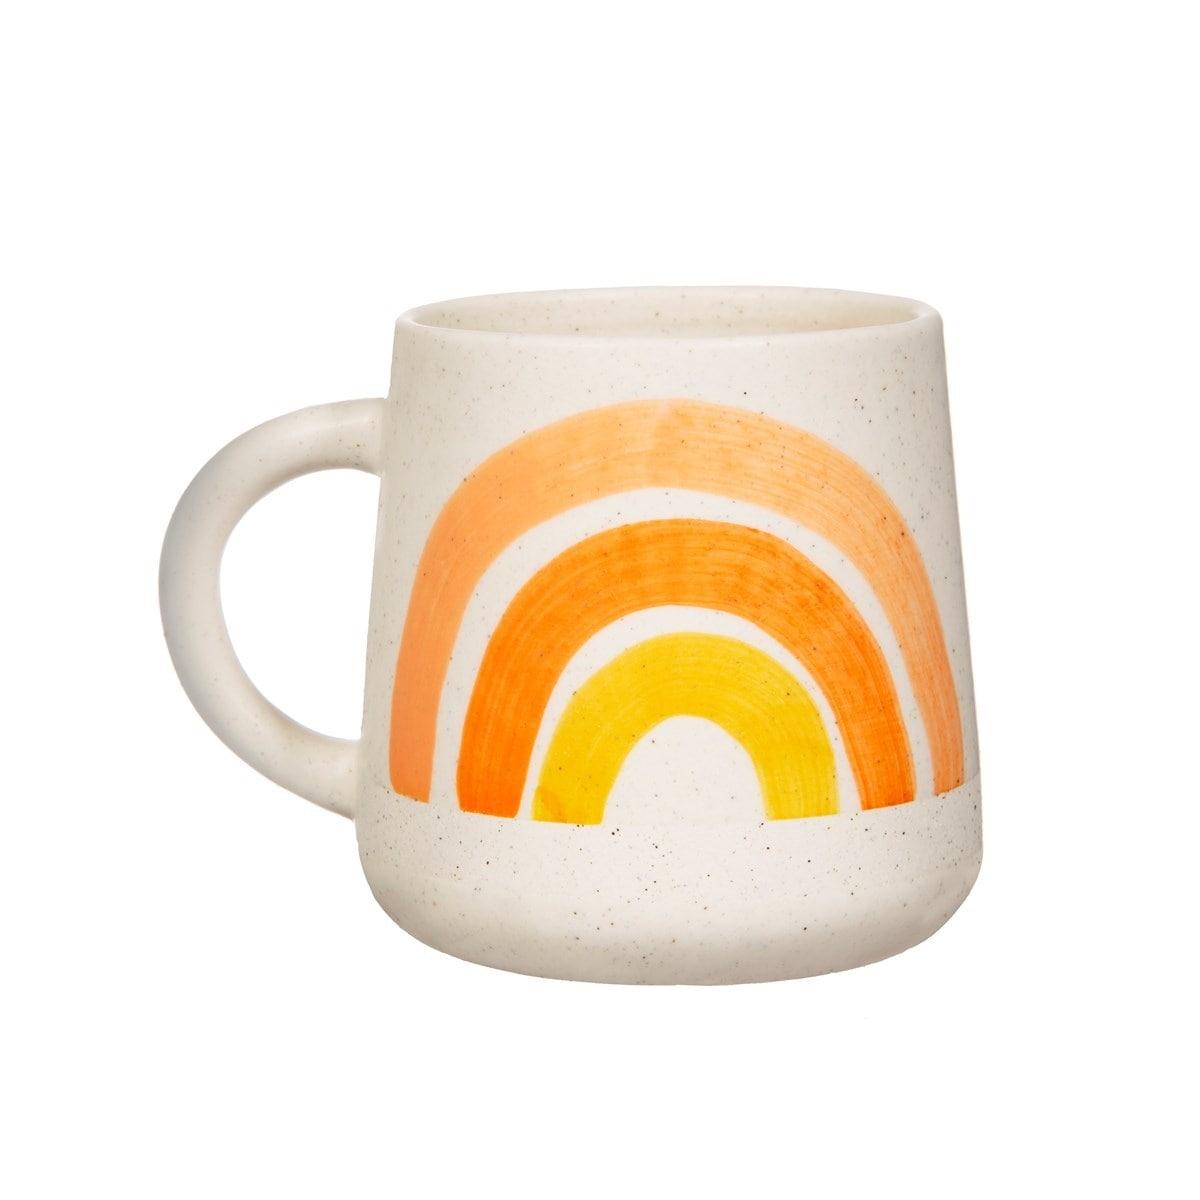 sass & belle Keramický hrnek Rainbow 500 ml, žlutá barva, oranžová barva, keramika